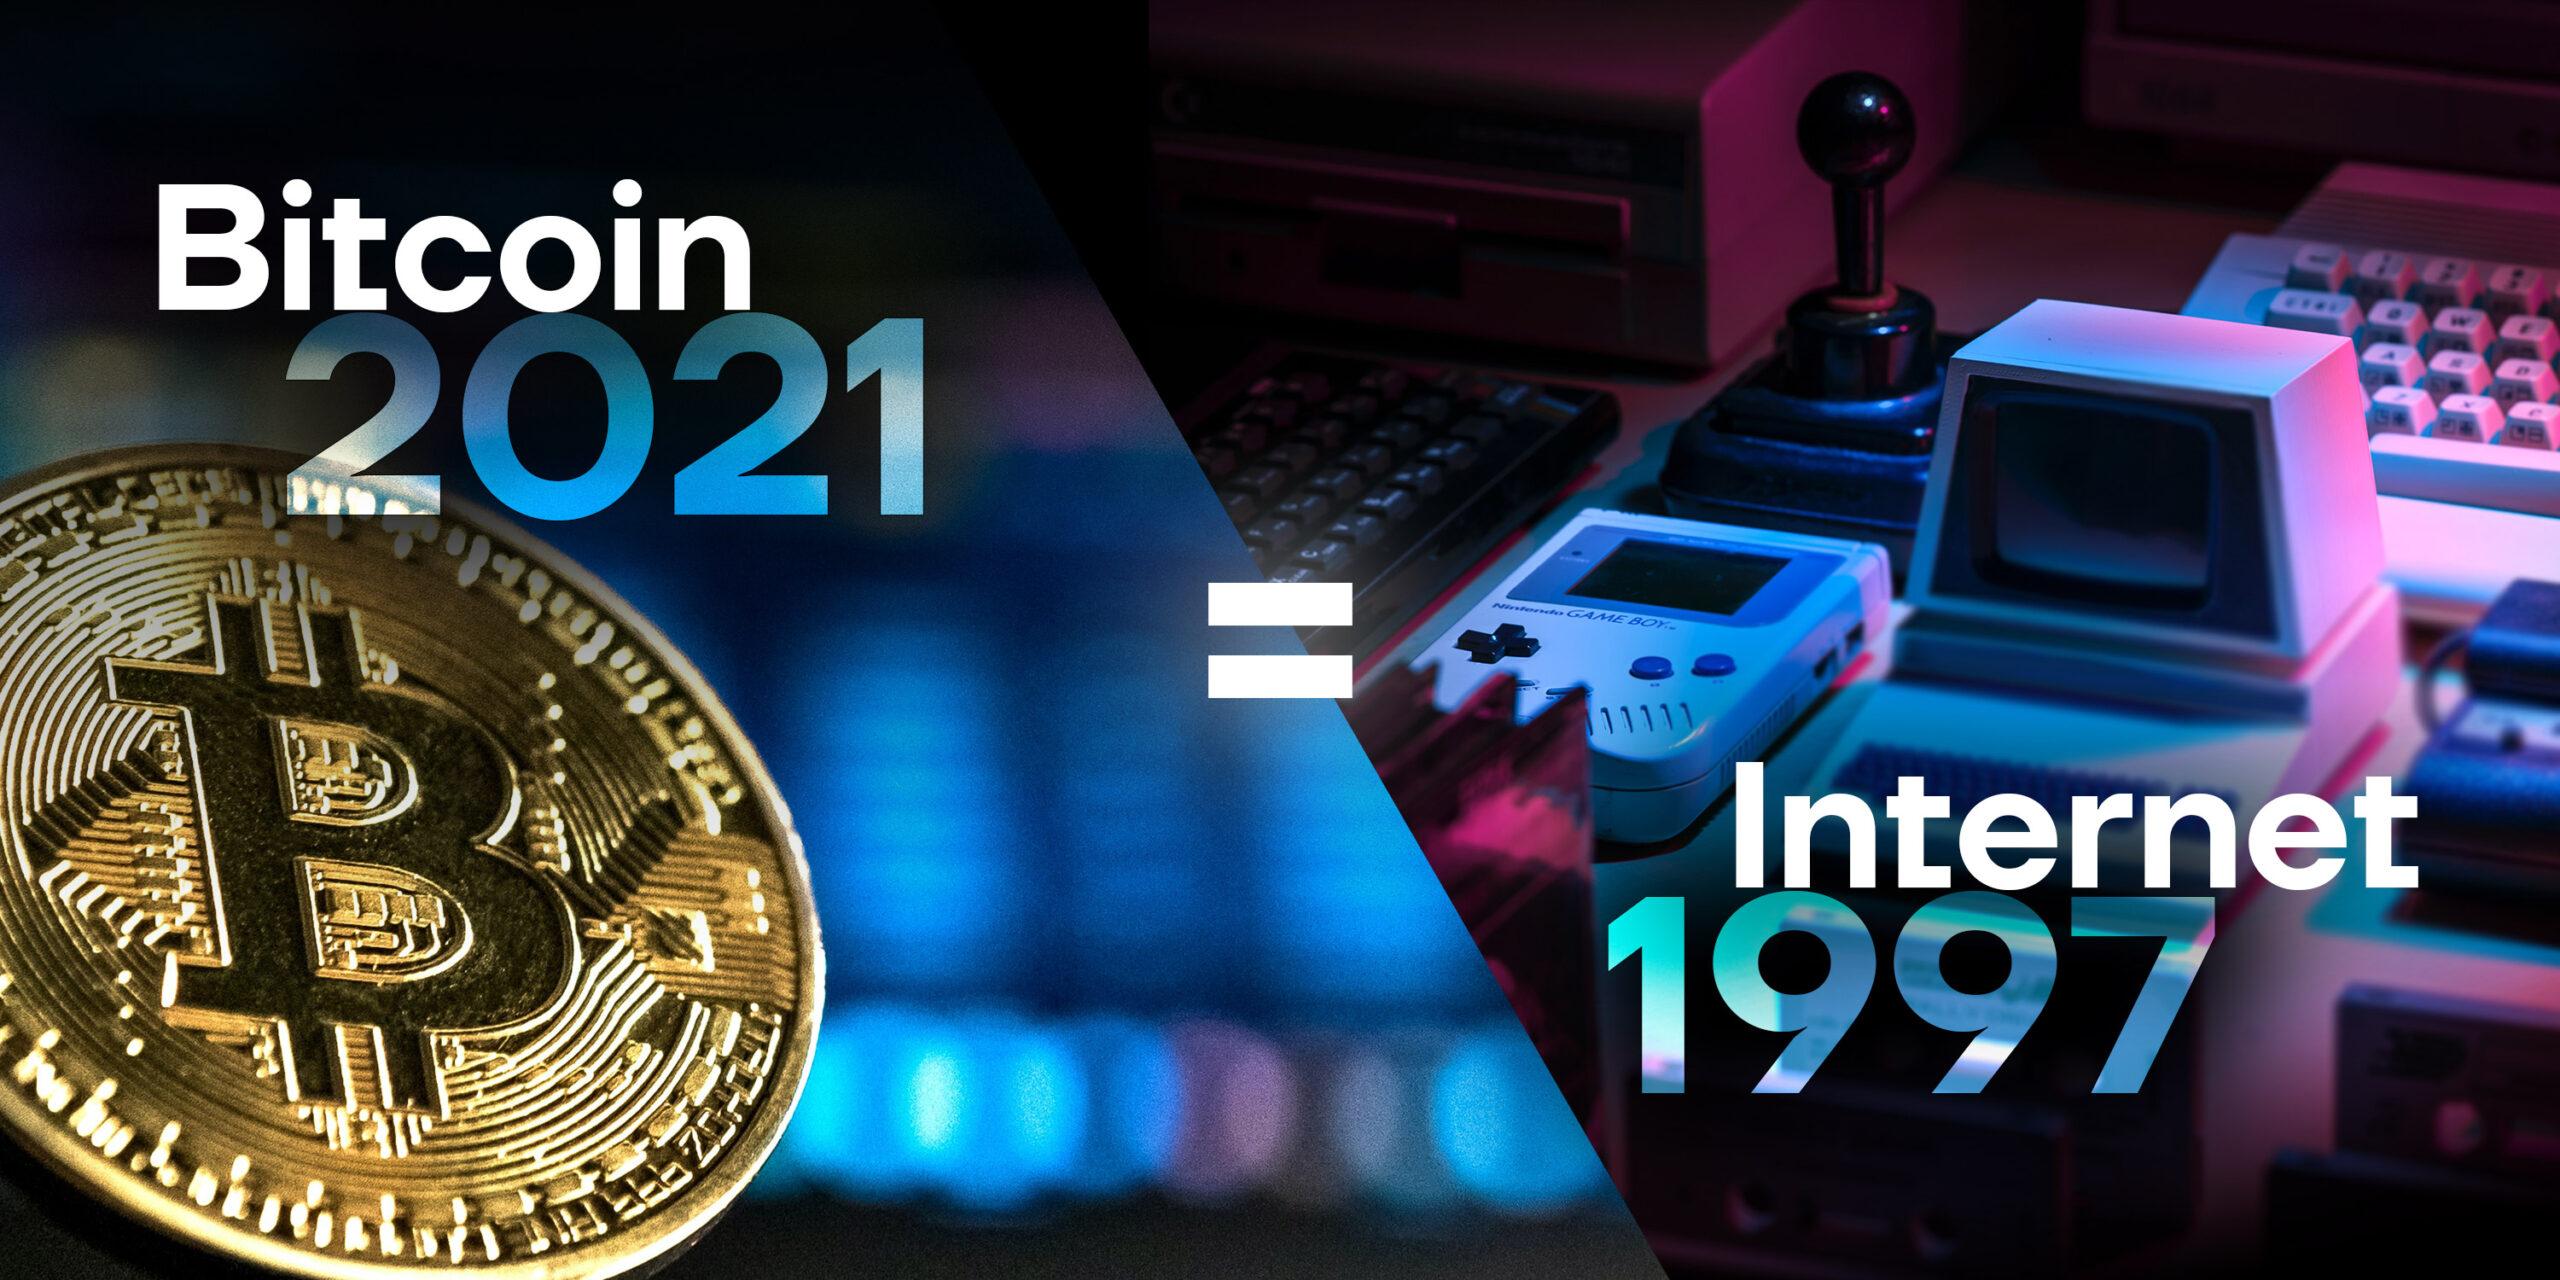 Bitcoin_2021_equals_Internet_1997